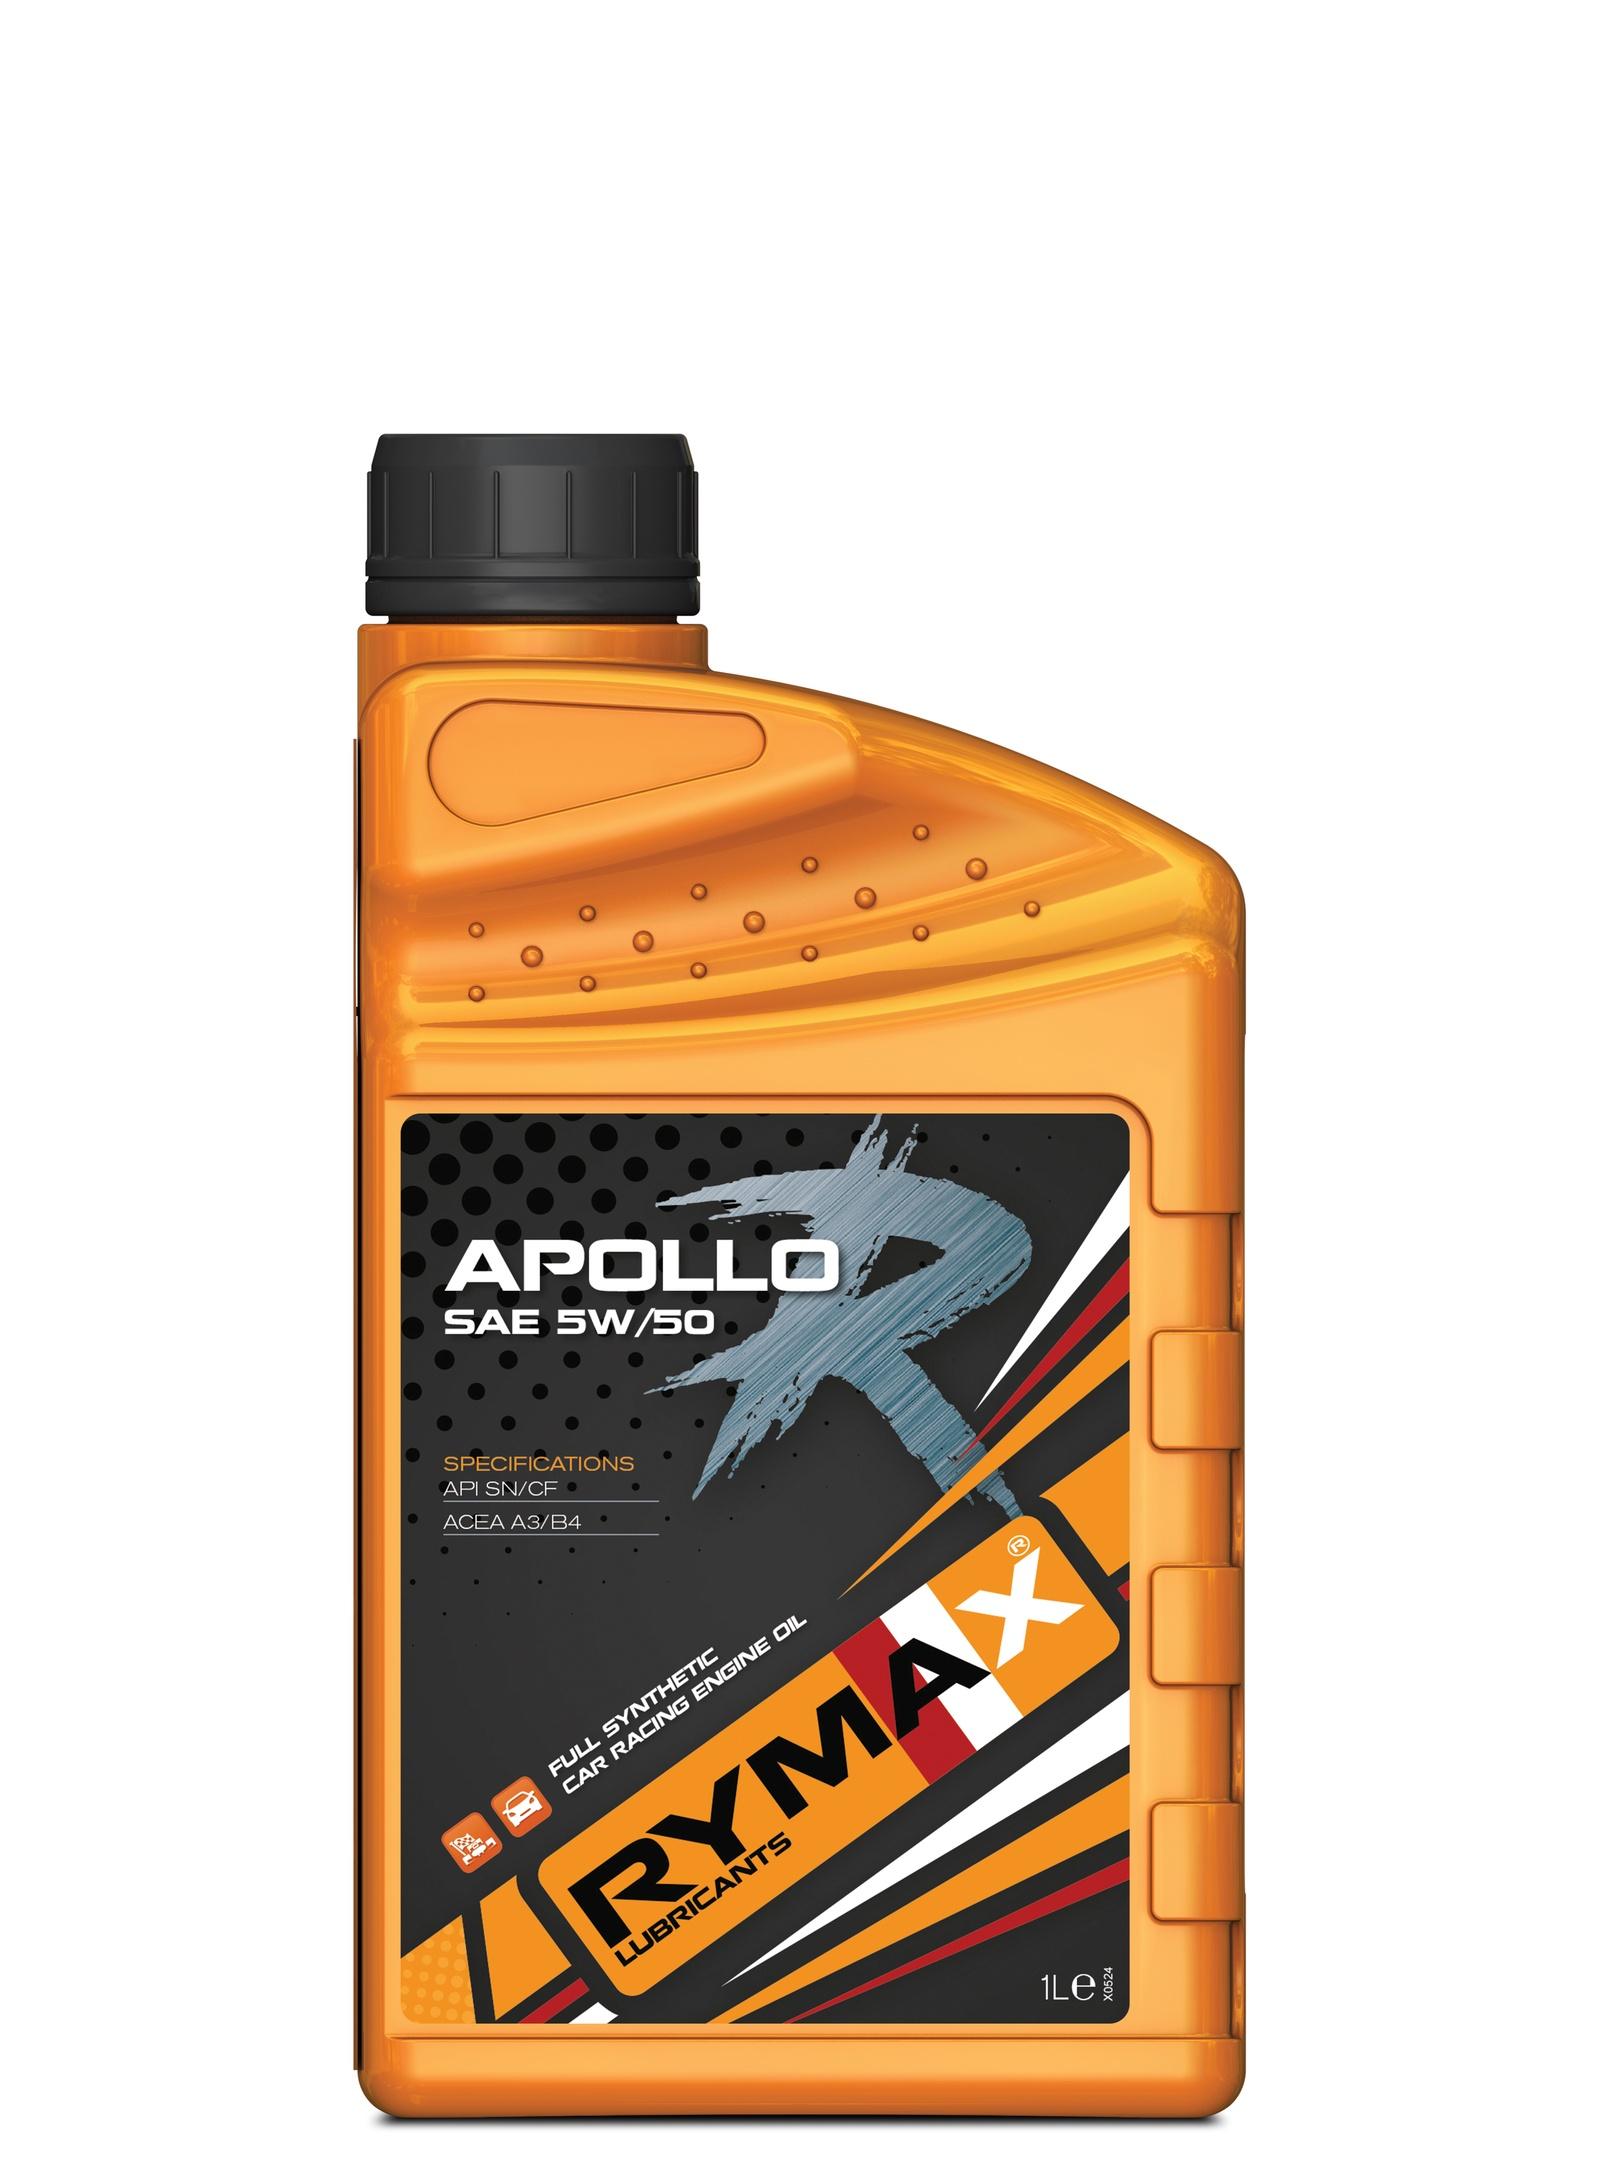 Моторное масло Rymax Apollo R SAE 5W-50, API SN/CF, ACEA A3/B4, спортивное на основе ПАО, 1 л